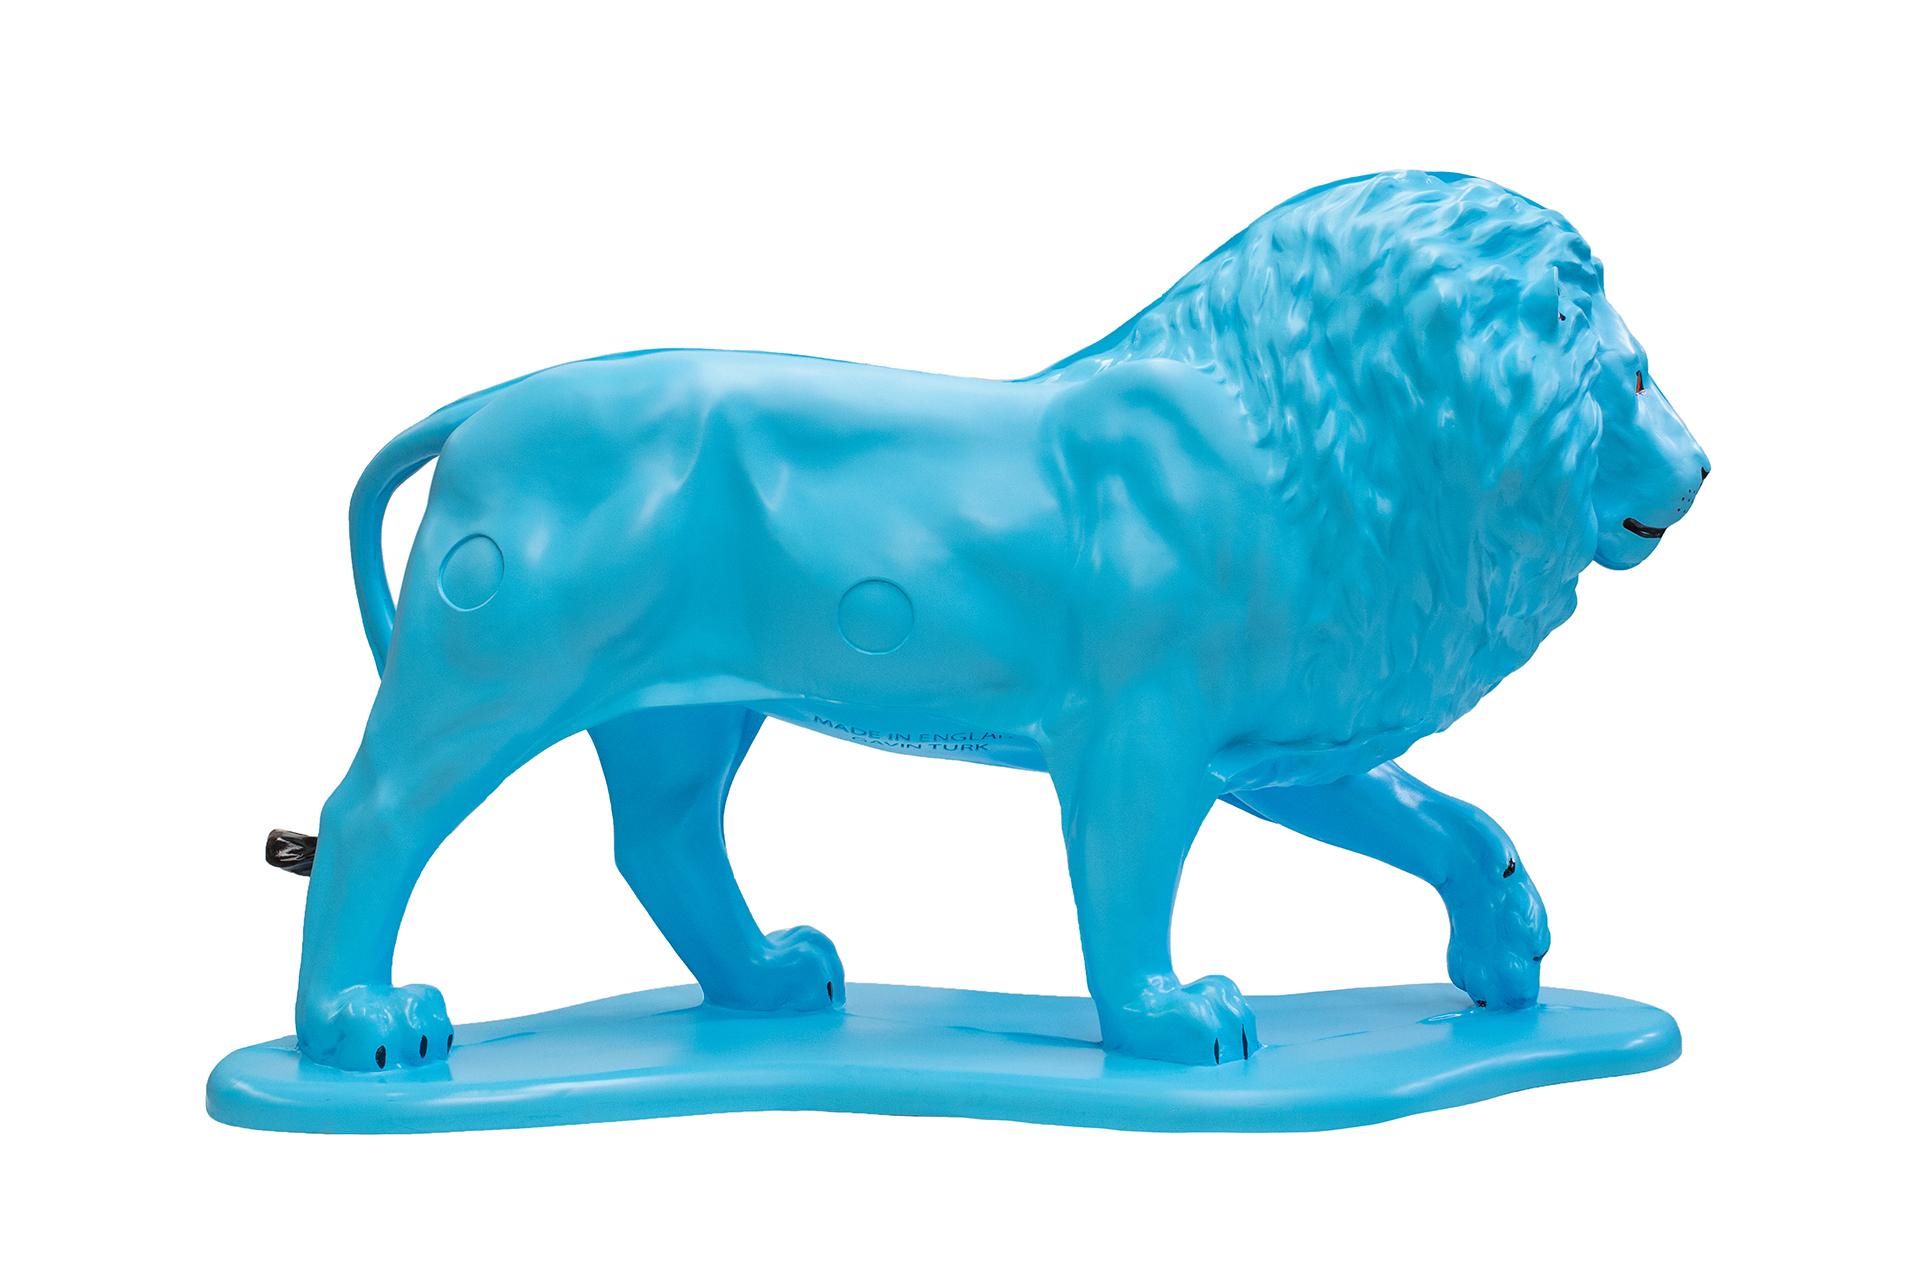 Tusk Lion Trail 2021 - Gavin Turk - Generously sponsored by Vodafone Foundation Image Credit: Nick Andrews